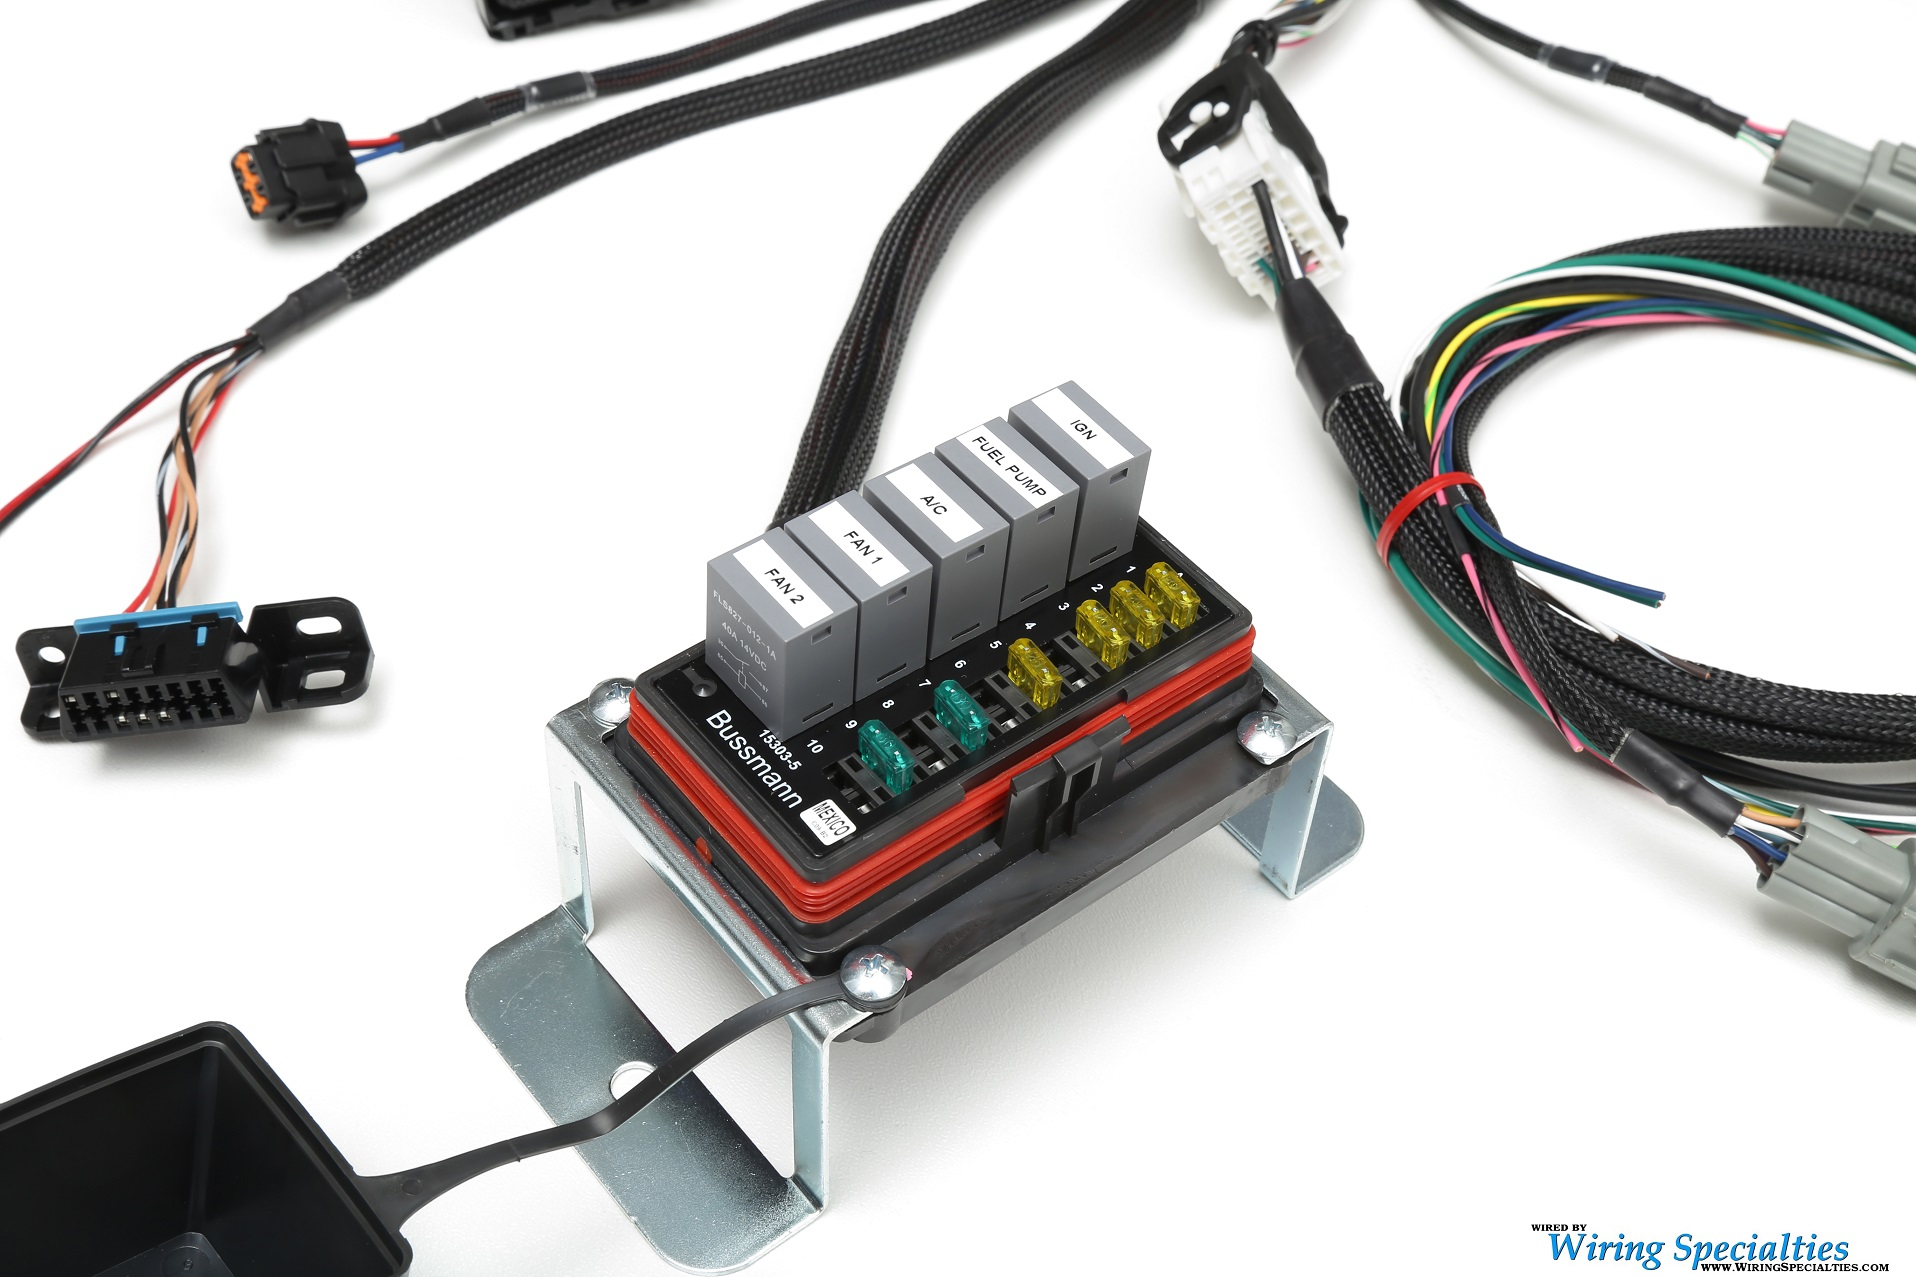 Classic Chevrolet 5.3L Vortec Swap Wiring Harness | Drive by Wire | Wiring  SpecialtiesWiring Specialties